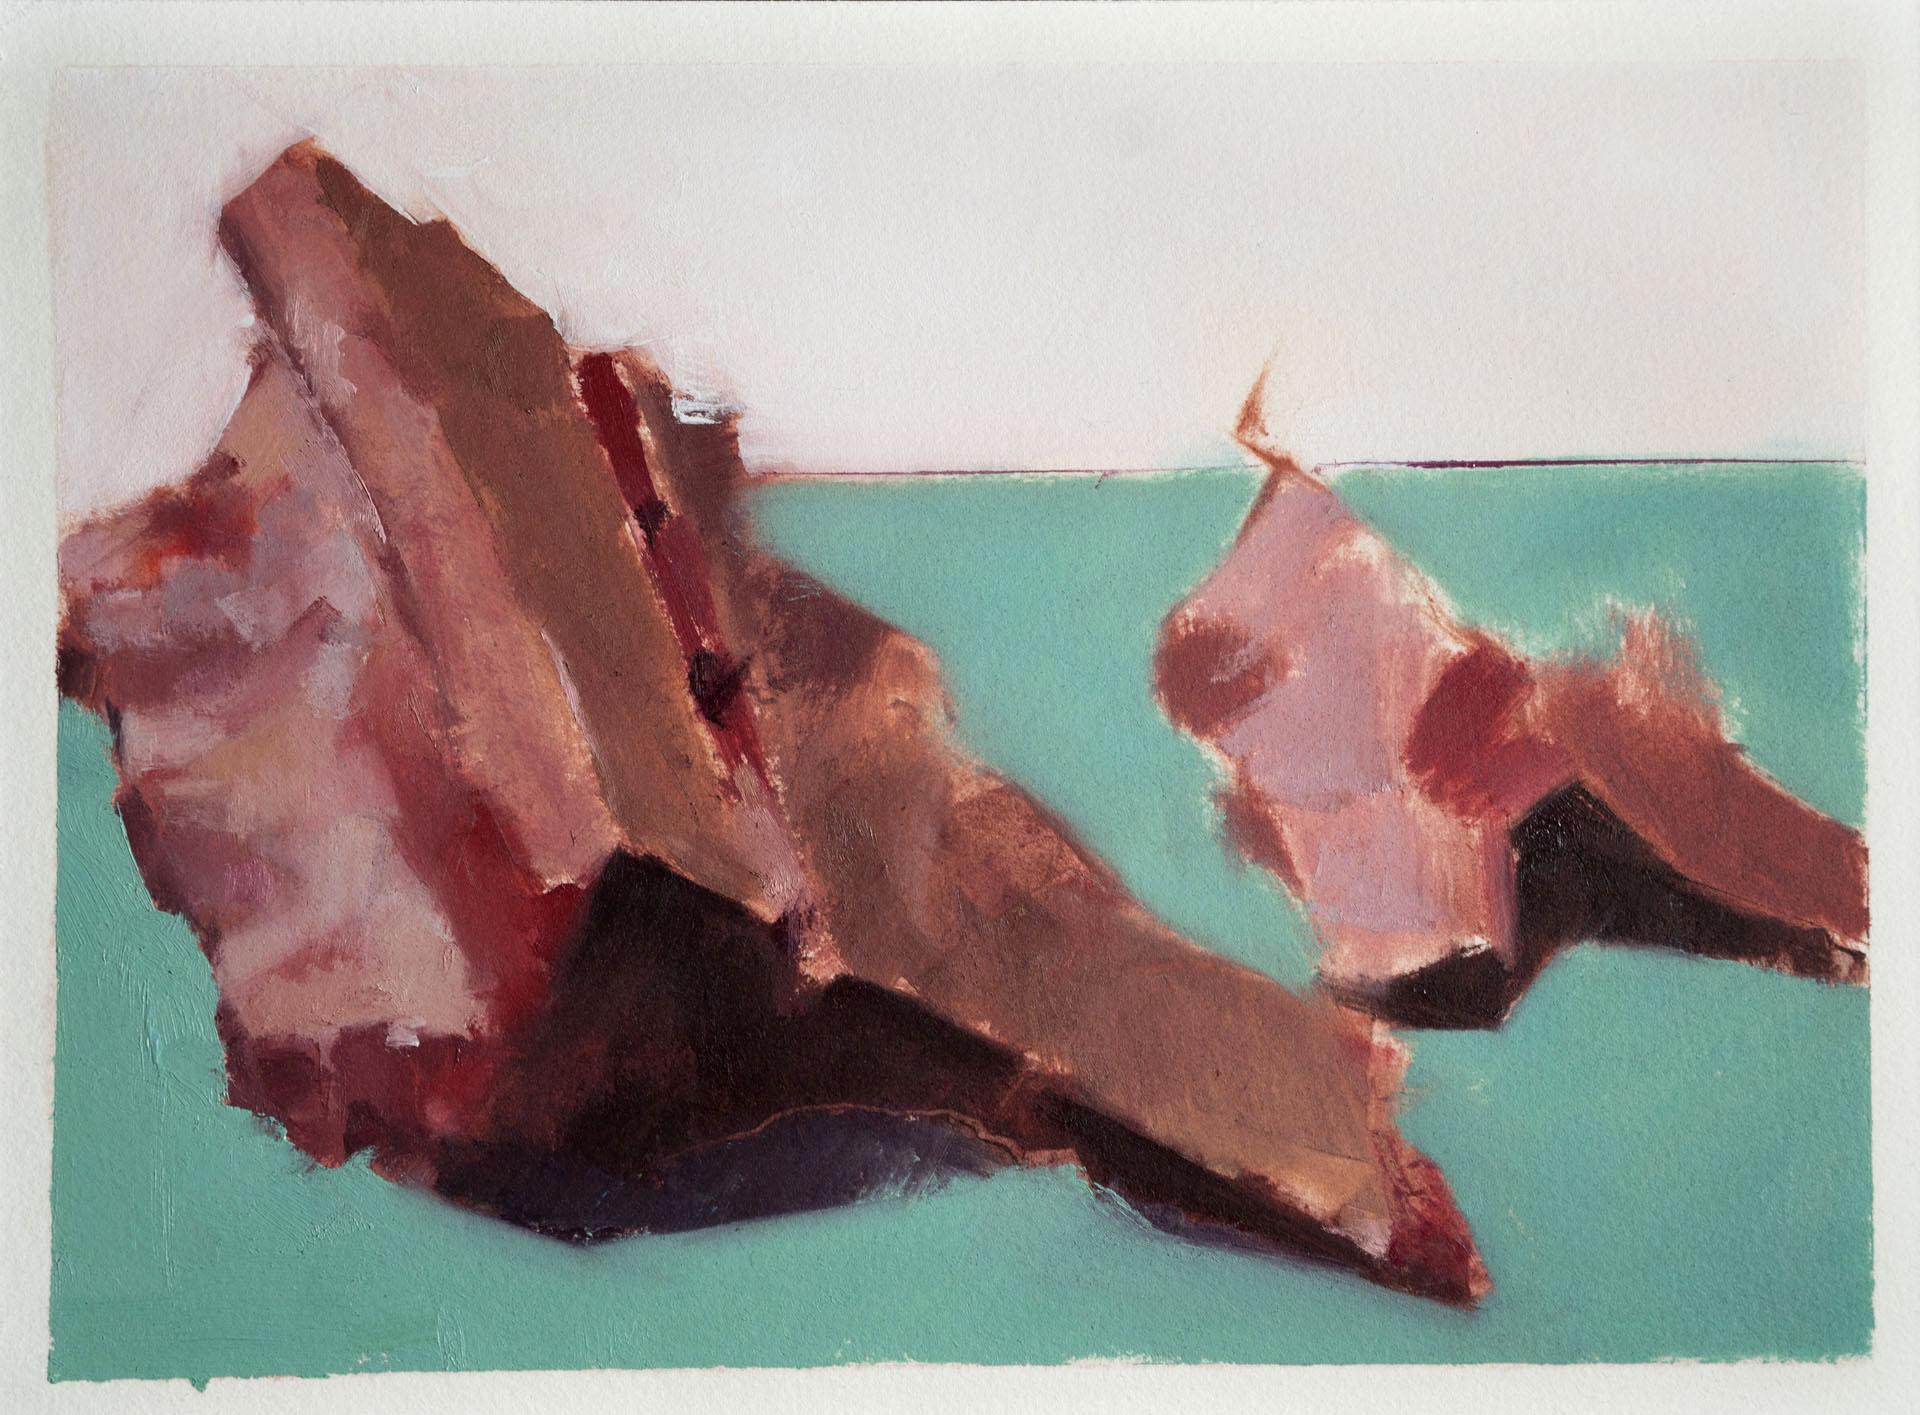 Untitled (Pork)